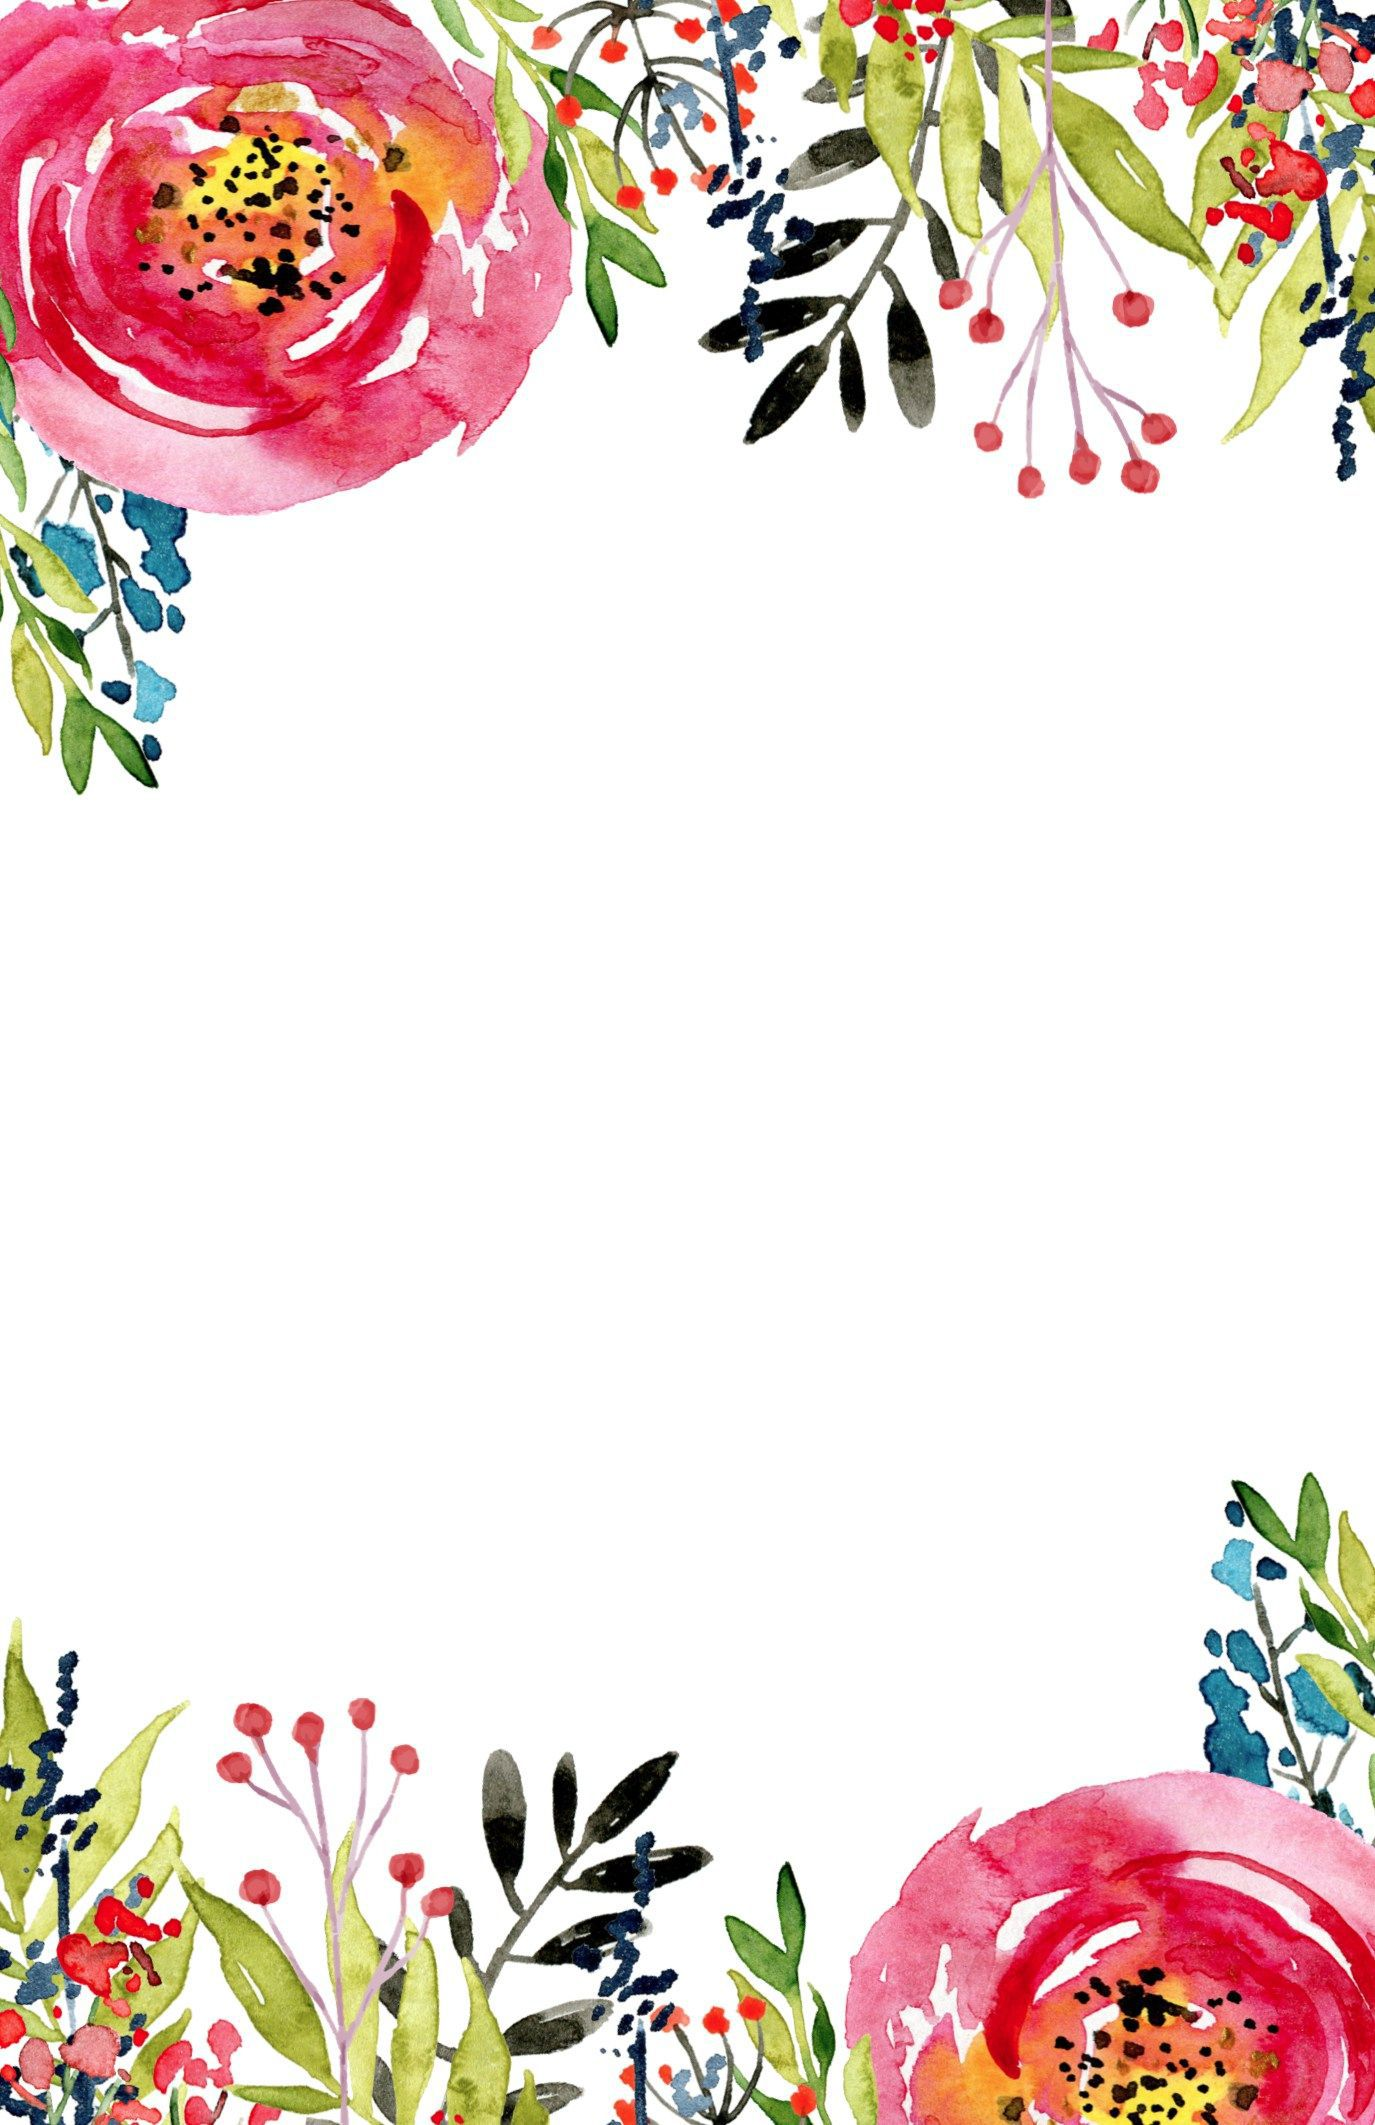 005 Incredible Free Invite Design Printable Photo  Wedding Place Card Template Birthday To PrintFull